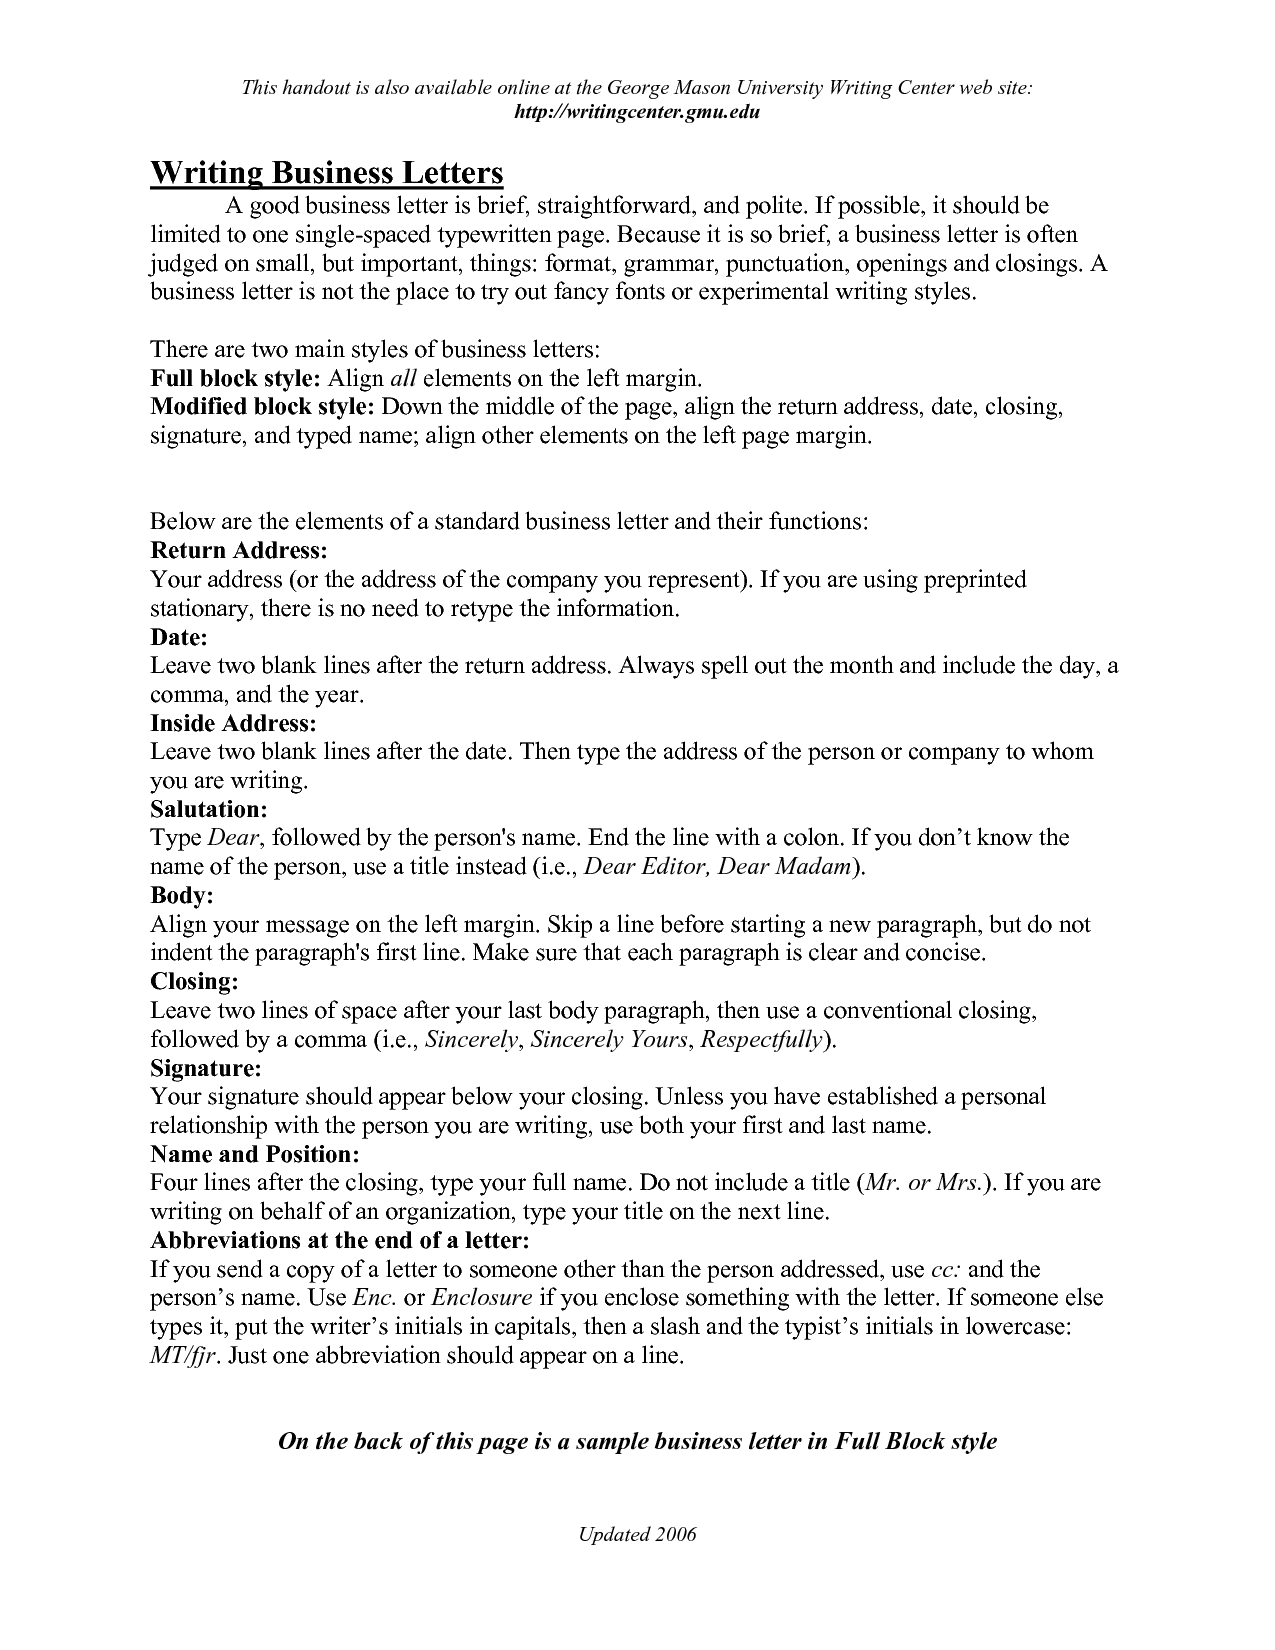 Write letter address french ideas about format horizontal write letter address french ideas about format horizontal alignment style cover using moderncv spiritdancerdesigns Choice Image